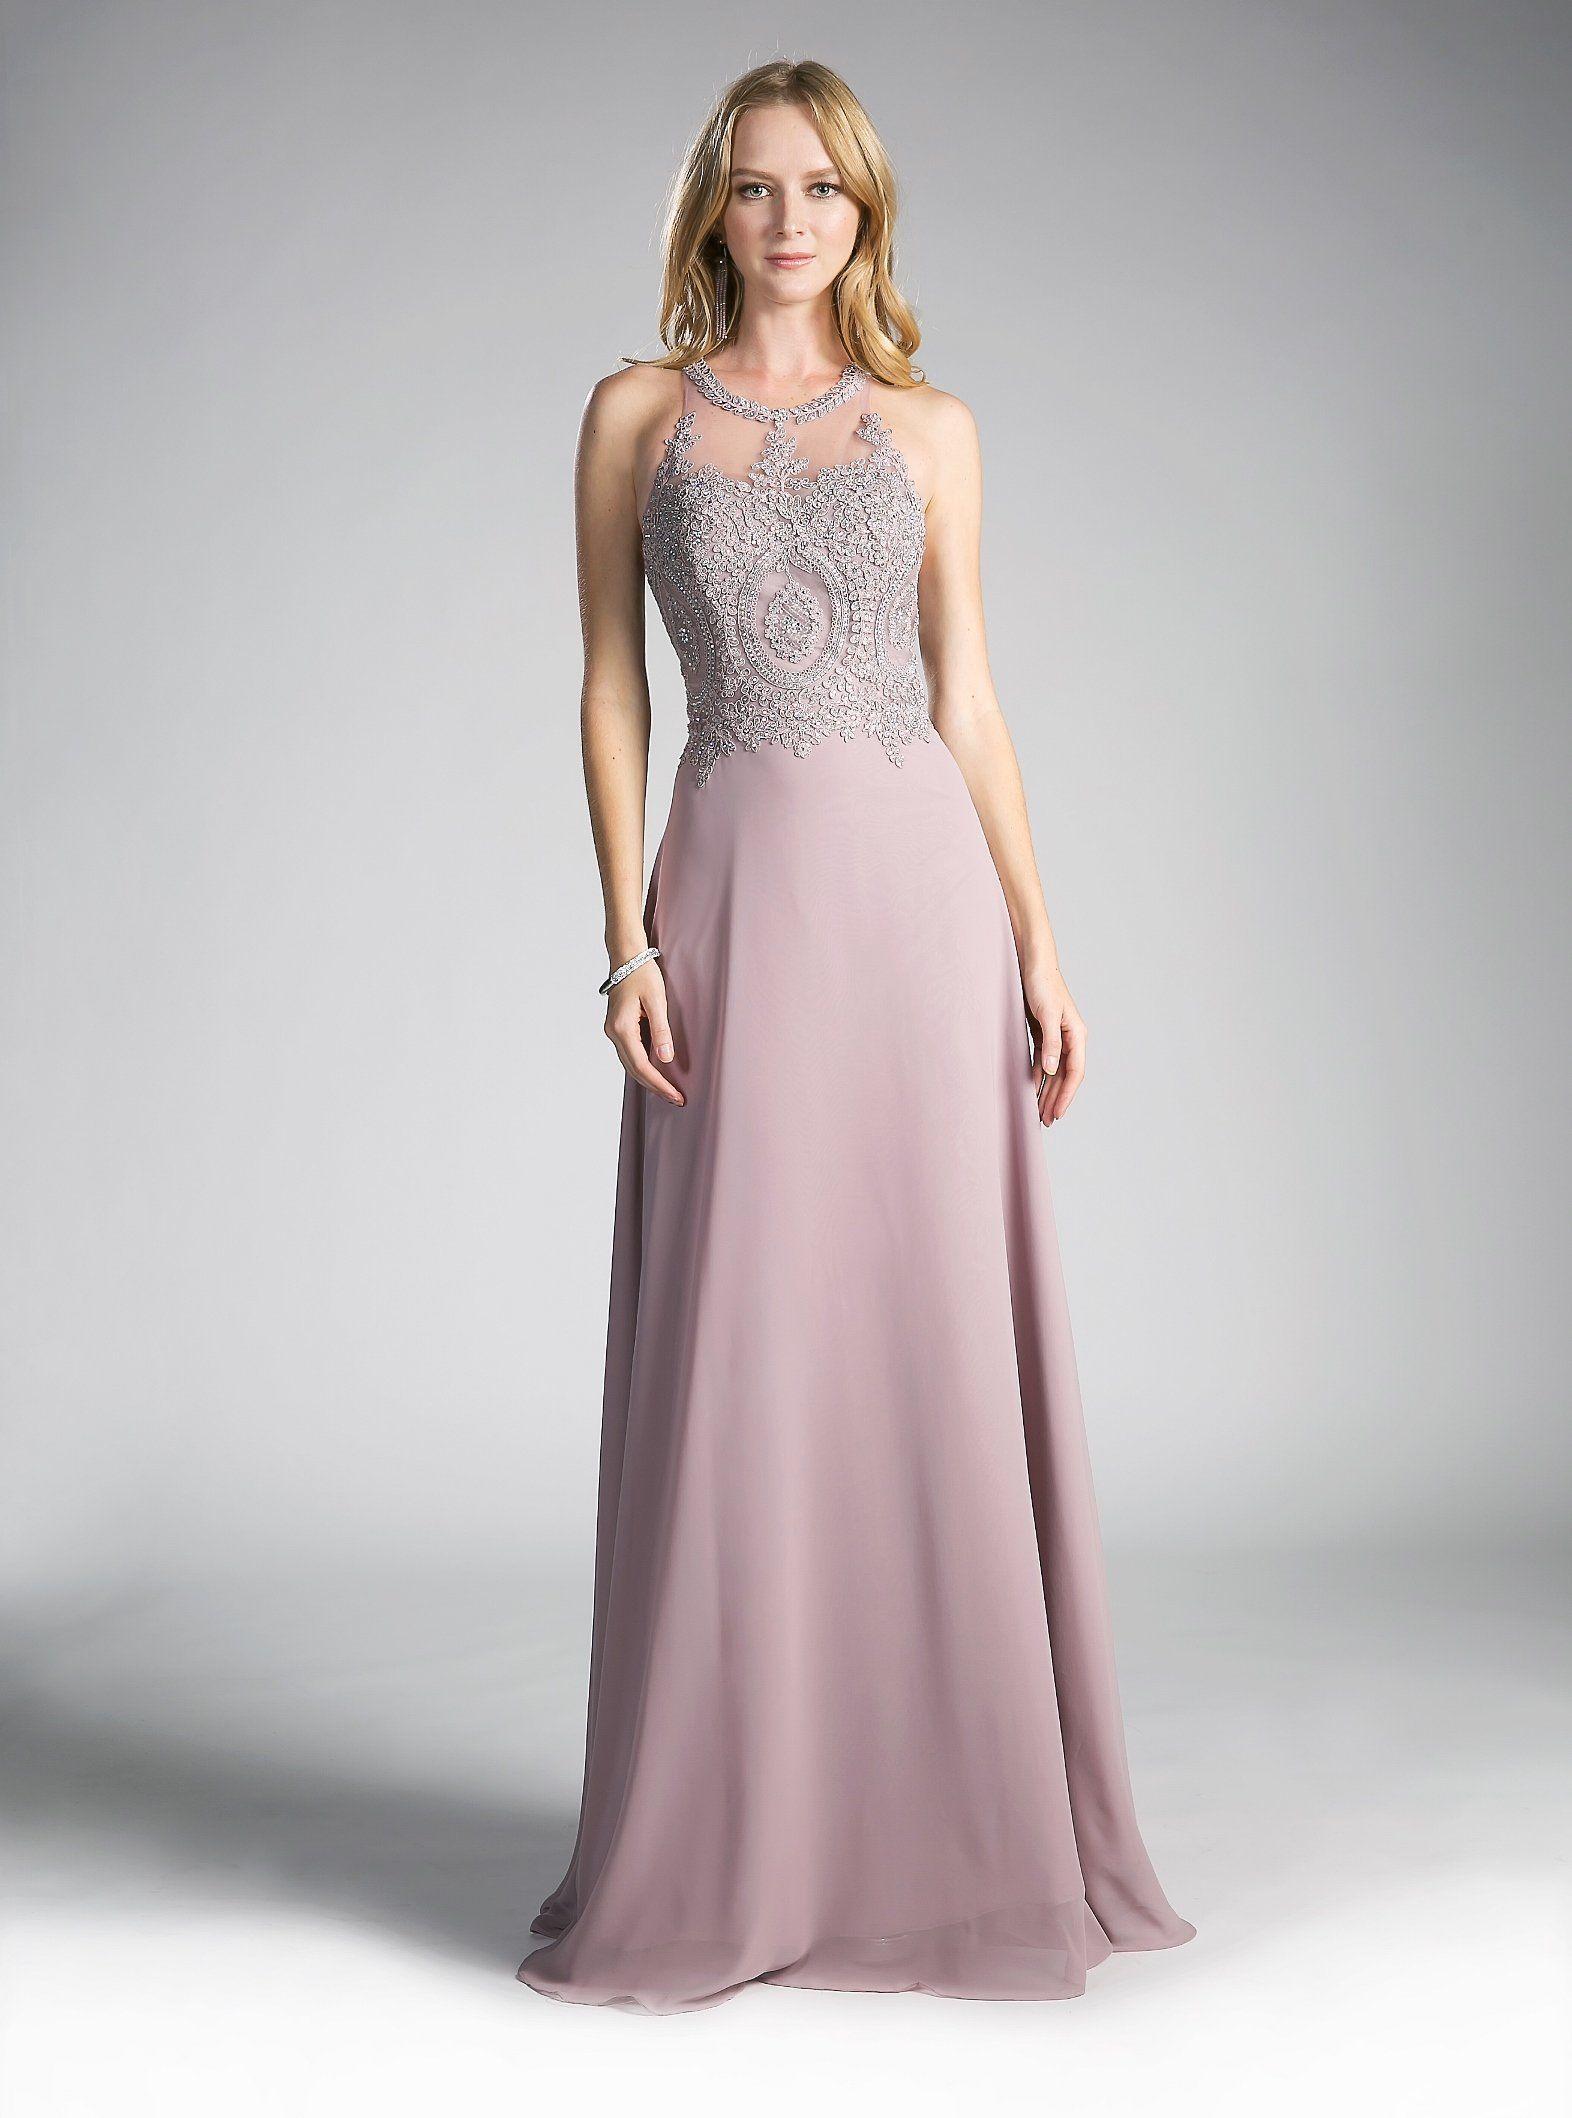 cbe49f5025c Long Illusion Dress with Appliqued Bodice by Cinderella Divine UJ0120